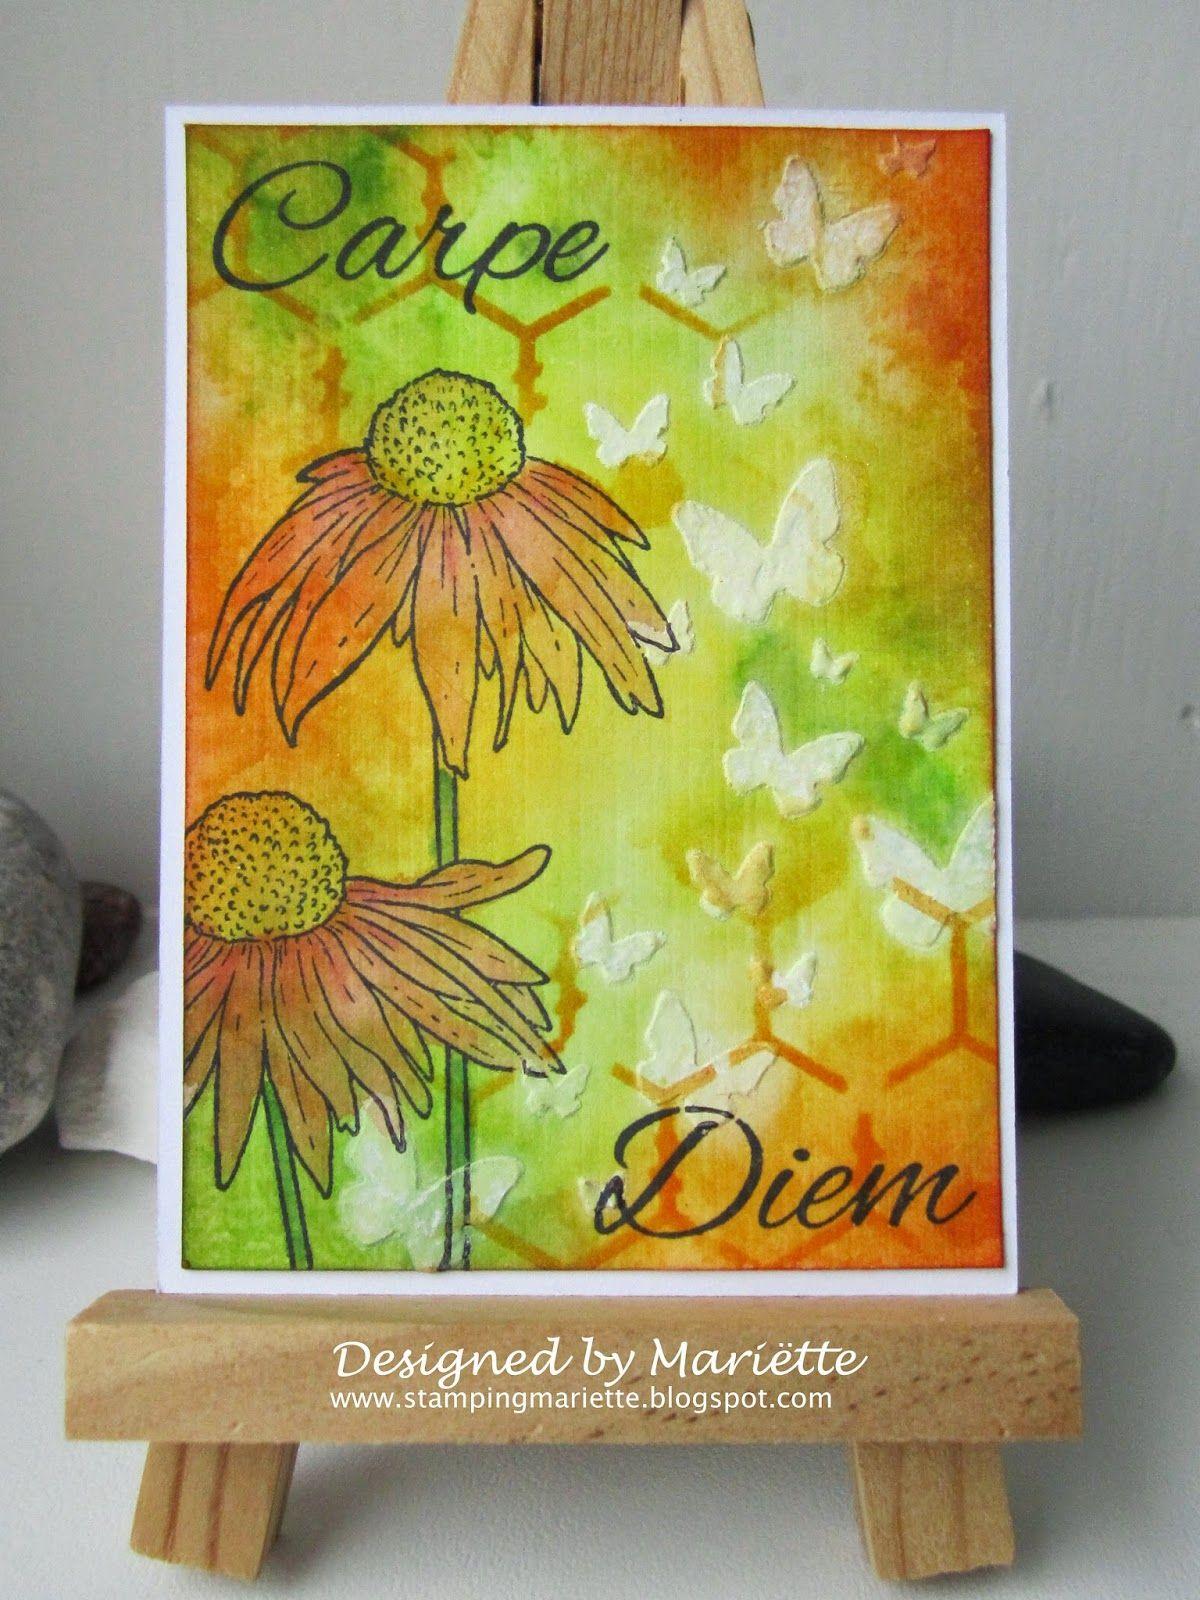 ATC met Magenta stempels en stencils, gesso en distress inkten         Magenta stempels:   Echinacea   Carpe Diem     Magenta stencils:   C...